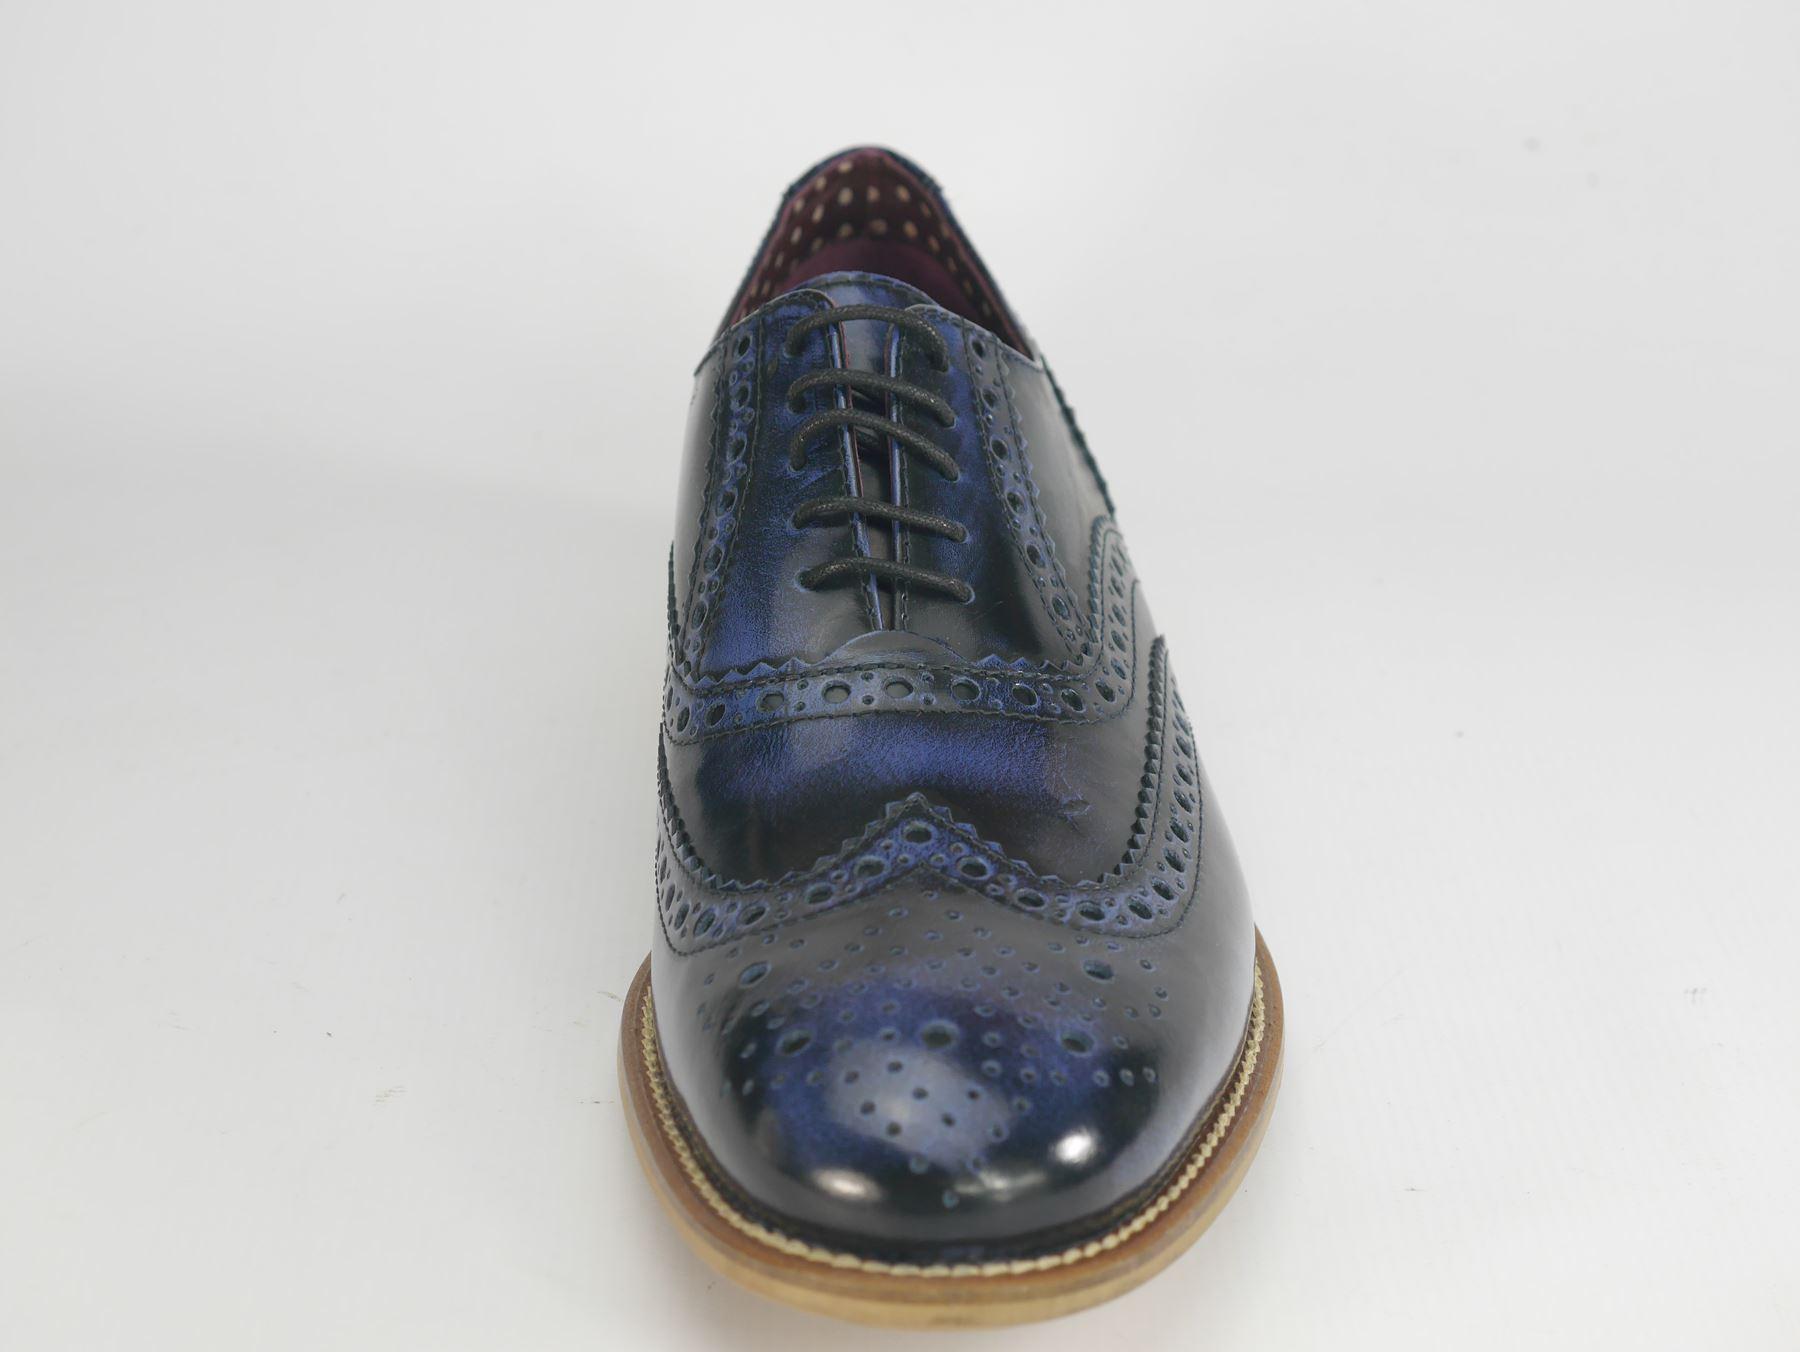 London Brogues  Uomo Formal Leder Lace Up Wingtip Formal Uomo GATSBY Evening Brogue Schuhes b04374